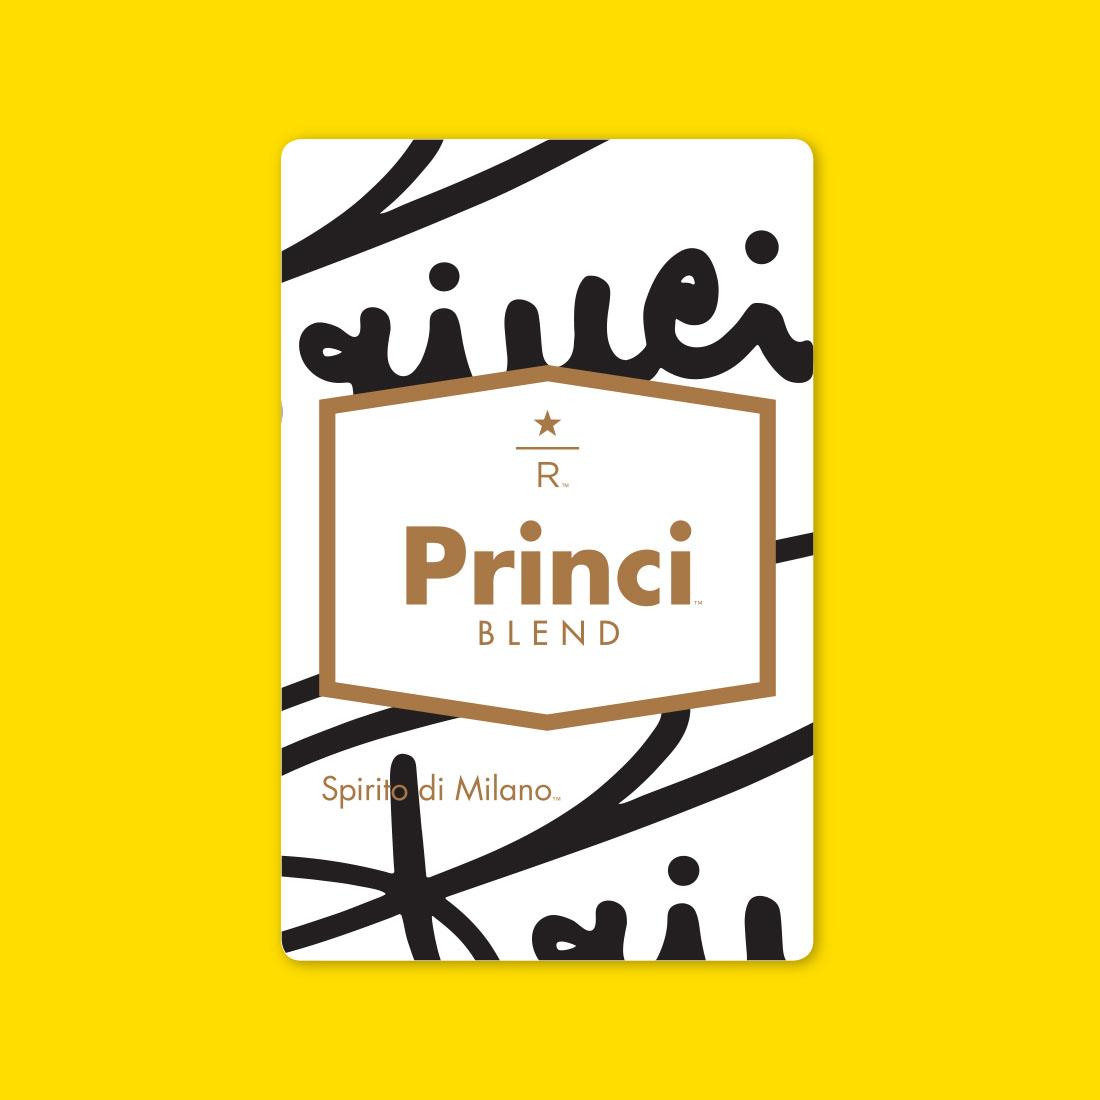 Coffee card illustration for PRINCI™ BLEND